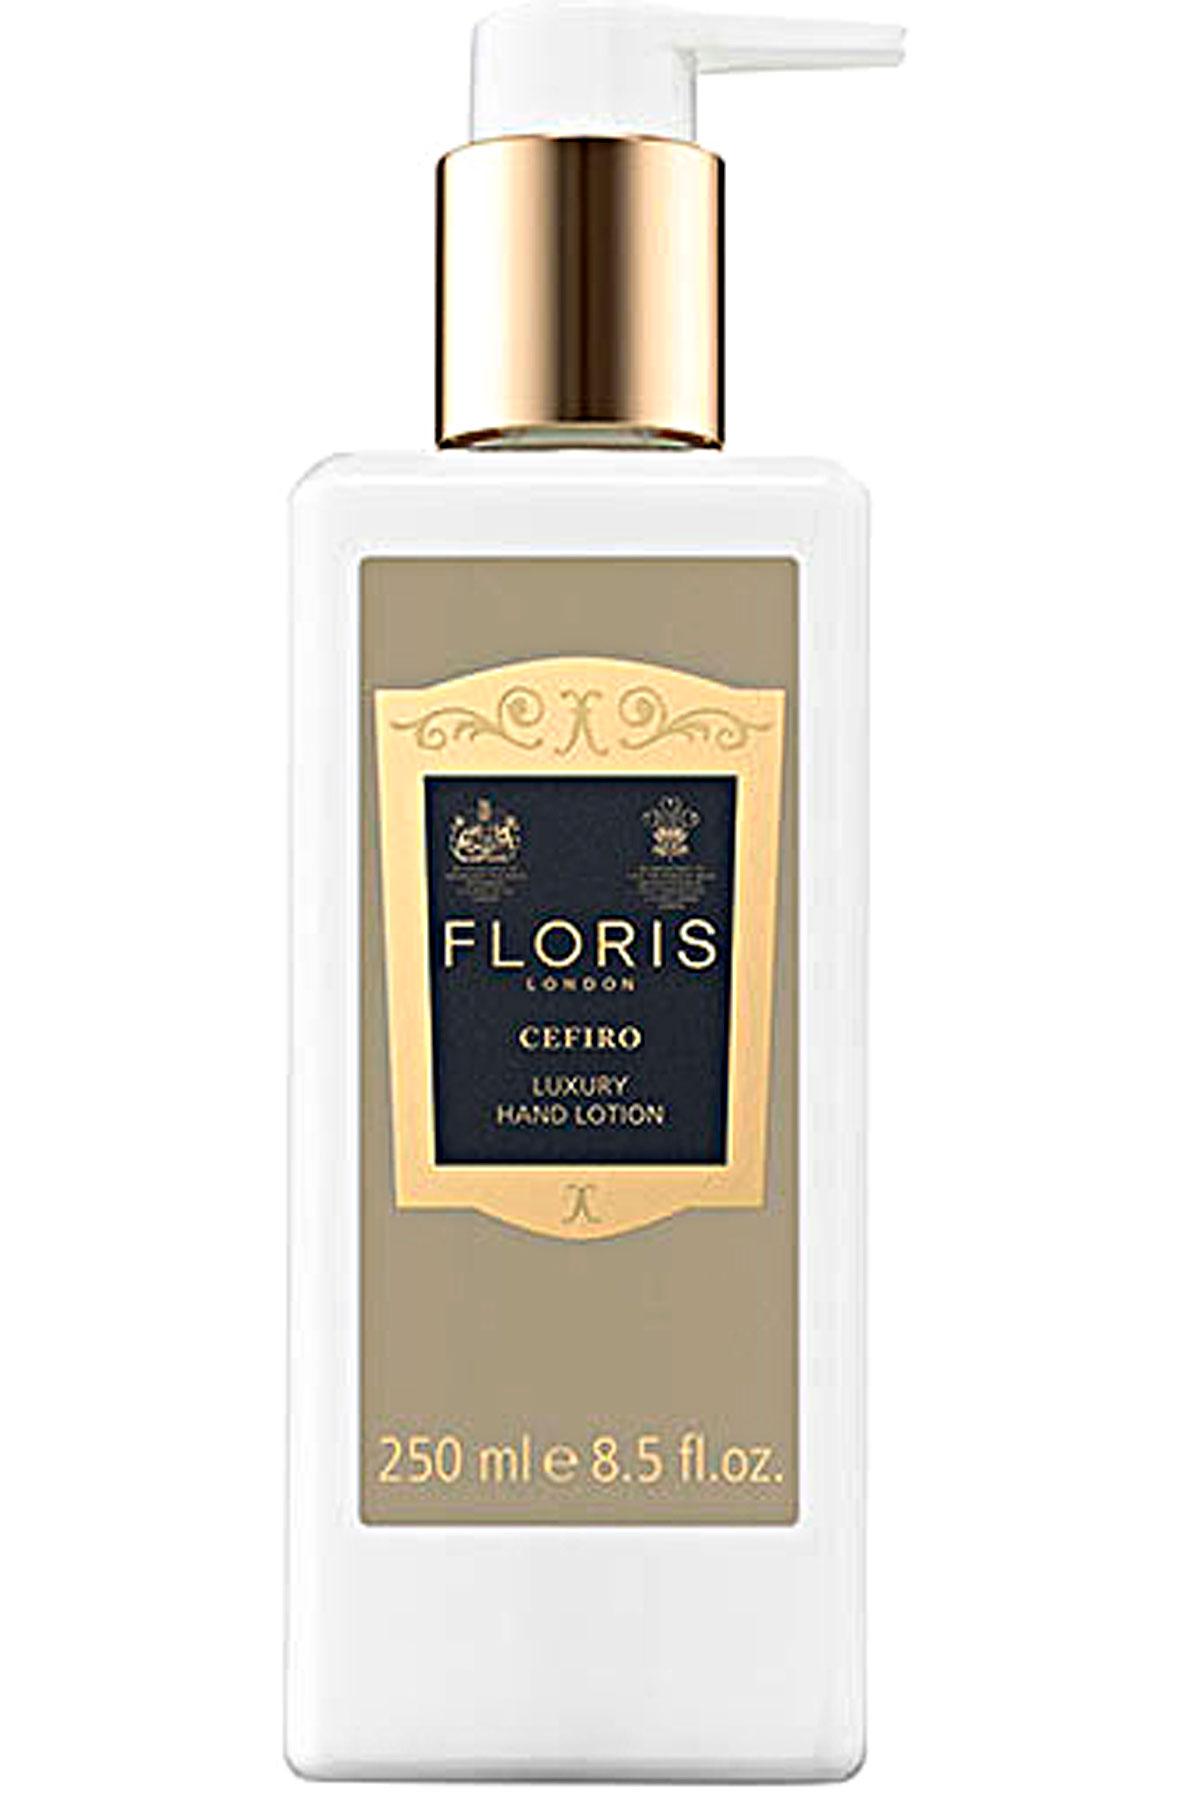 Floris London Beauty for Women On Sale, Cefiro - Hand Lotion - 250 Ml, 2019, 250 ml